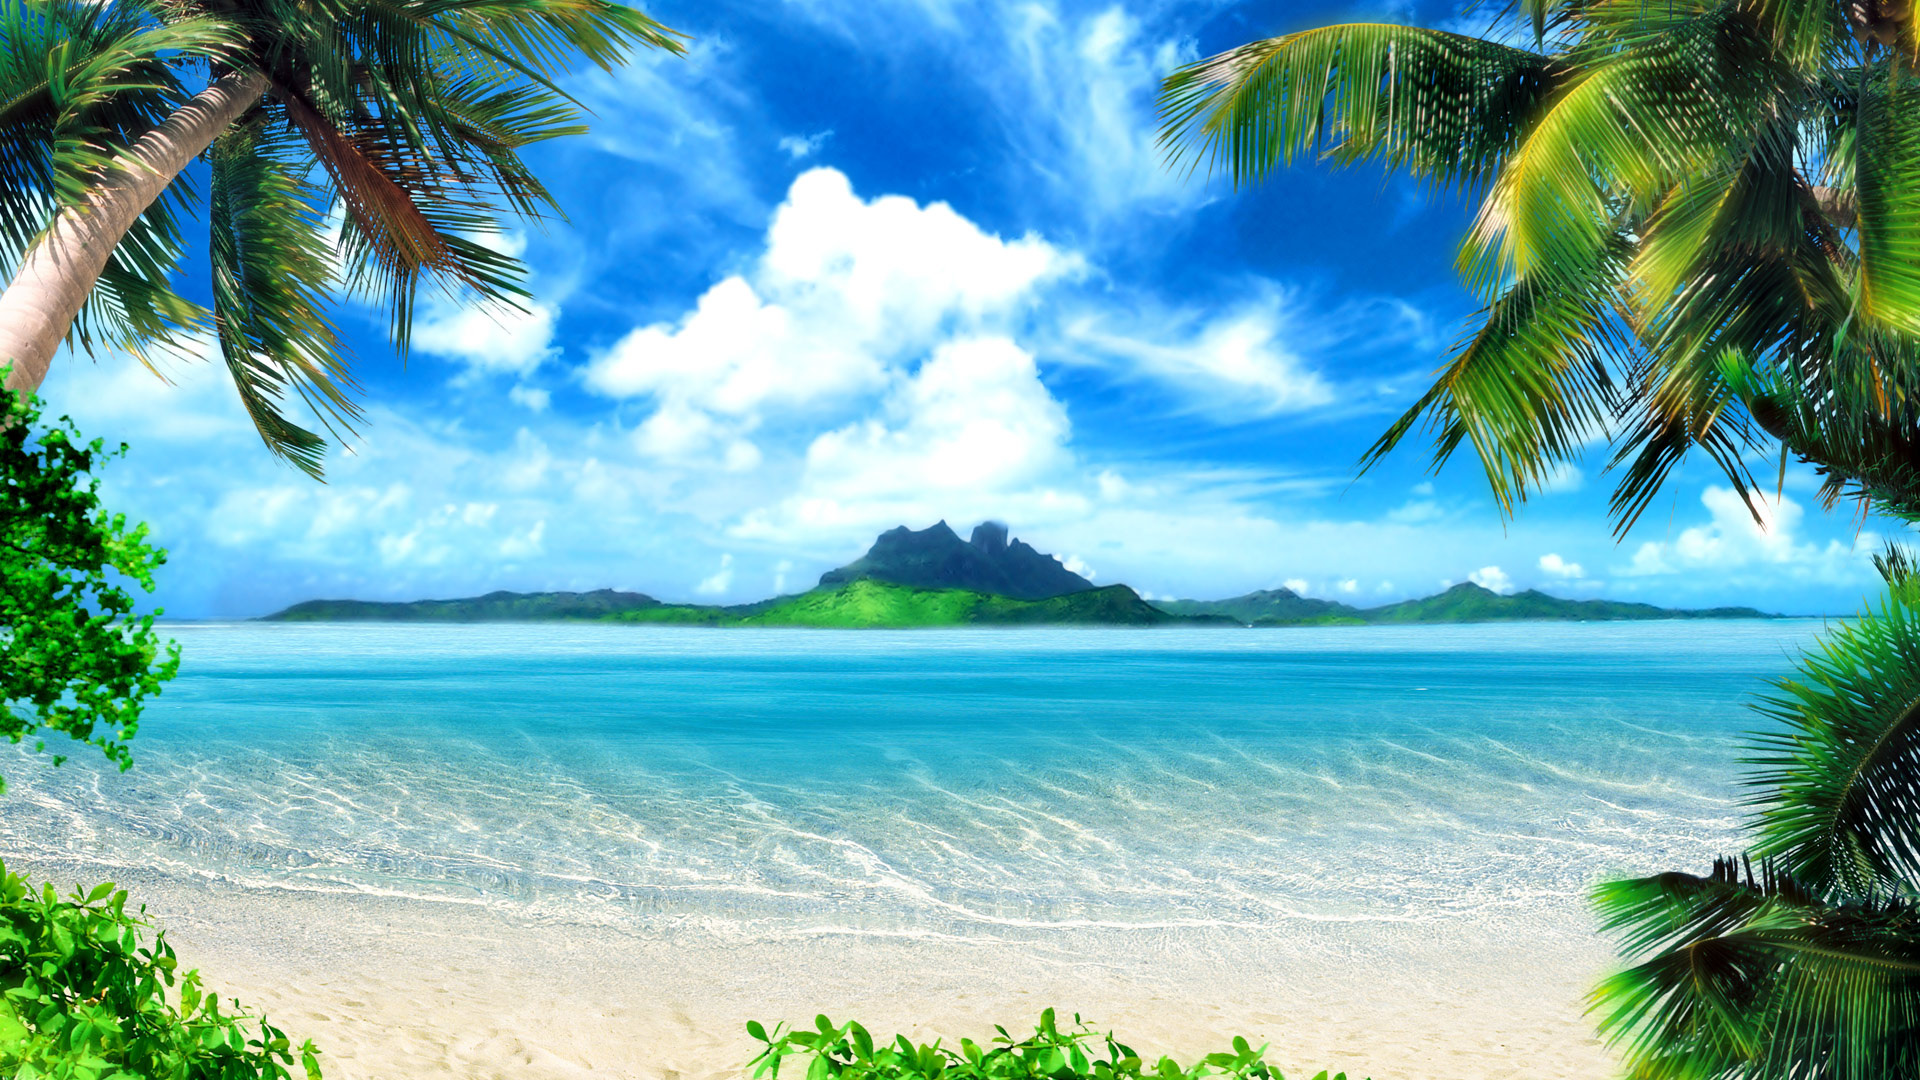 Wallpaper palm trees beach sea paradise desktop hd desktop Wallpaper 1920x1080